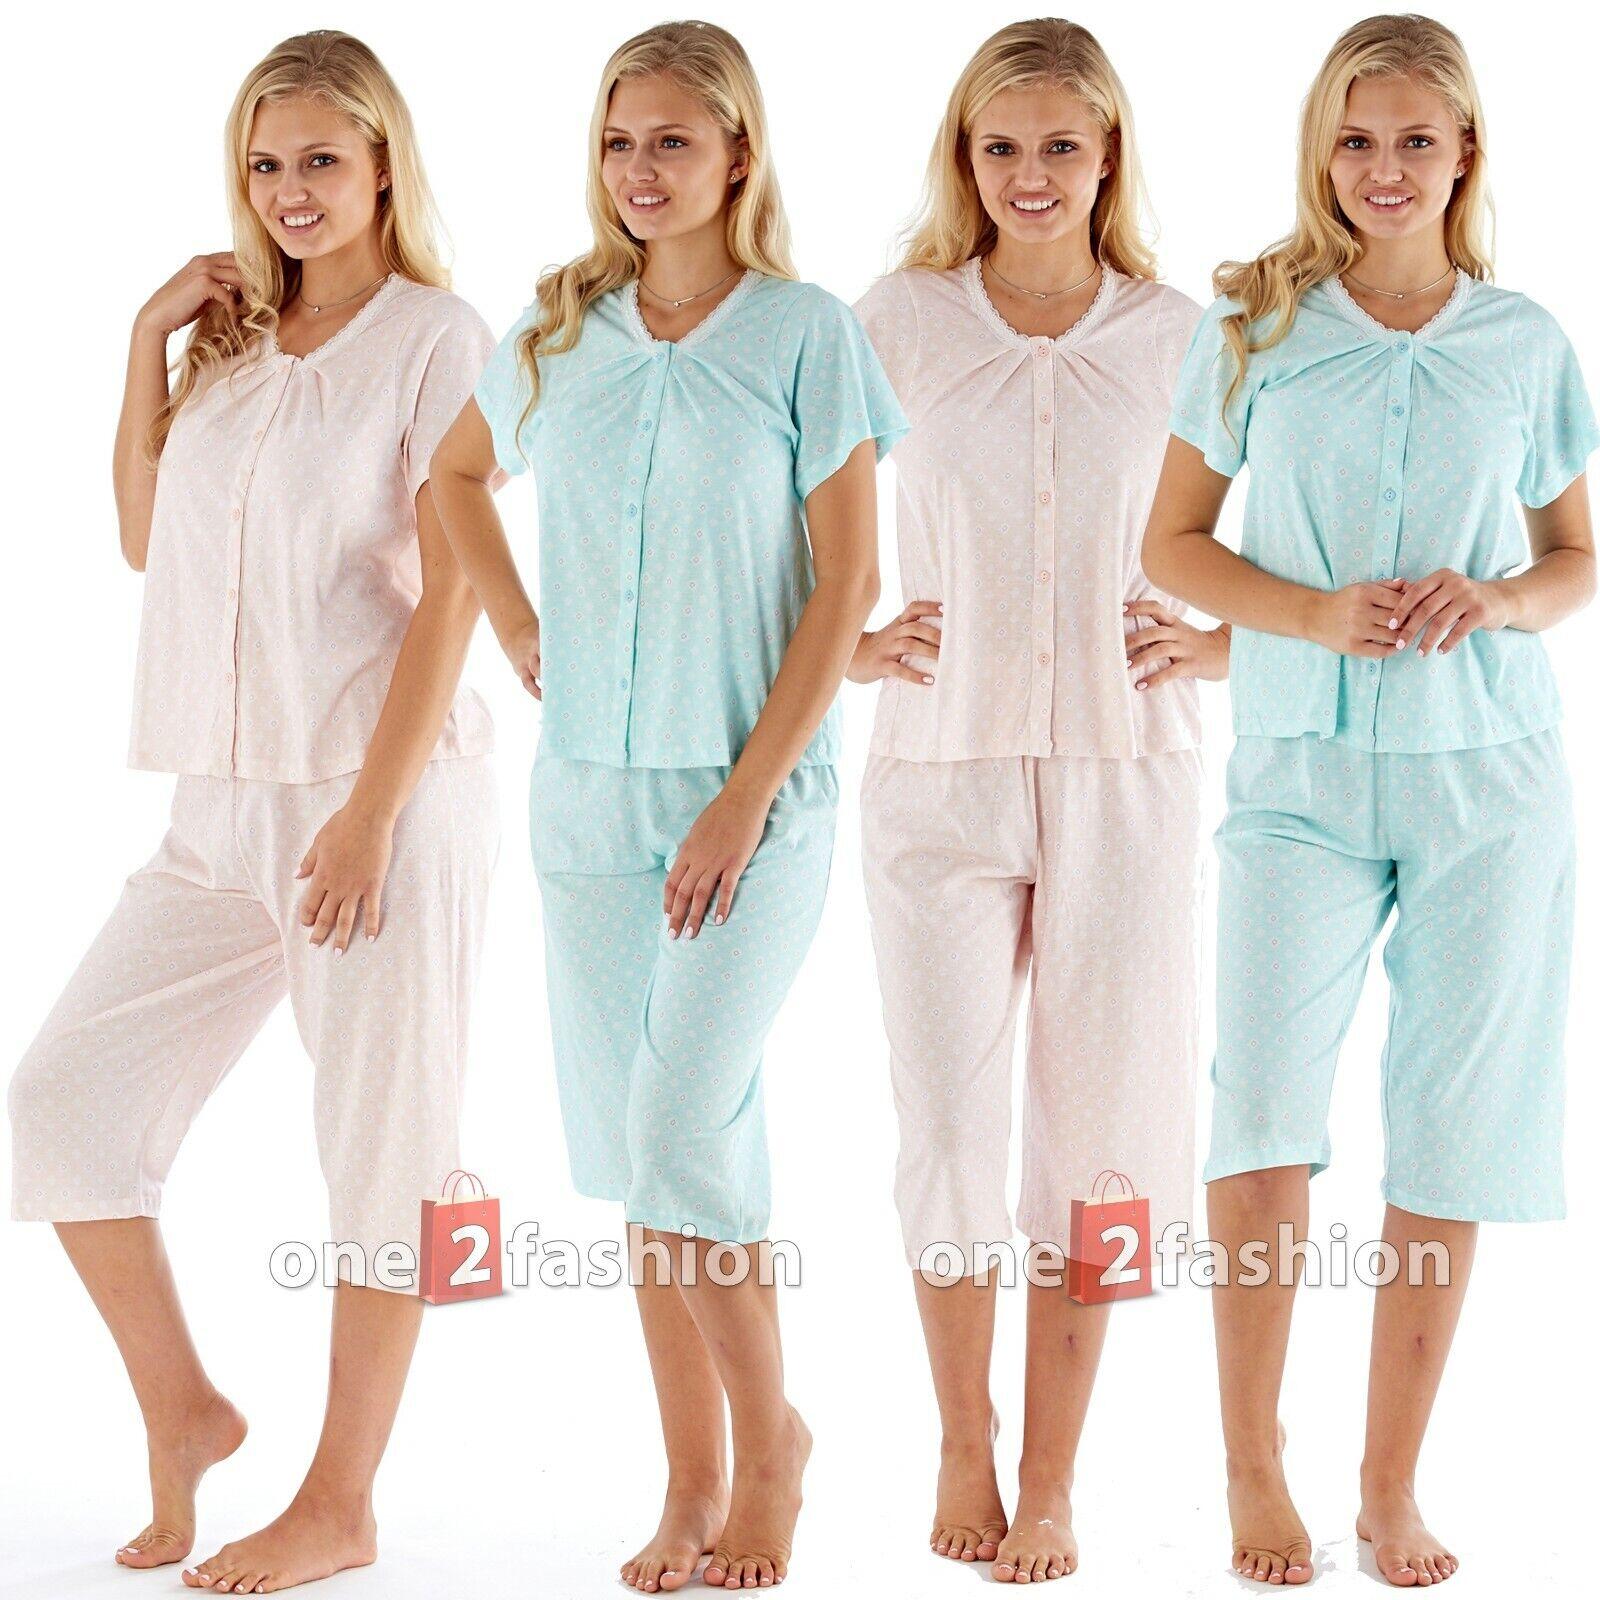 Ladies 2 Piece Pyjamas Suit Set Cotton Summer Loungewear Nightwear pjs Womens